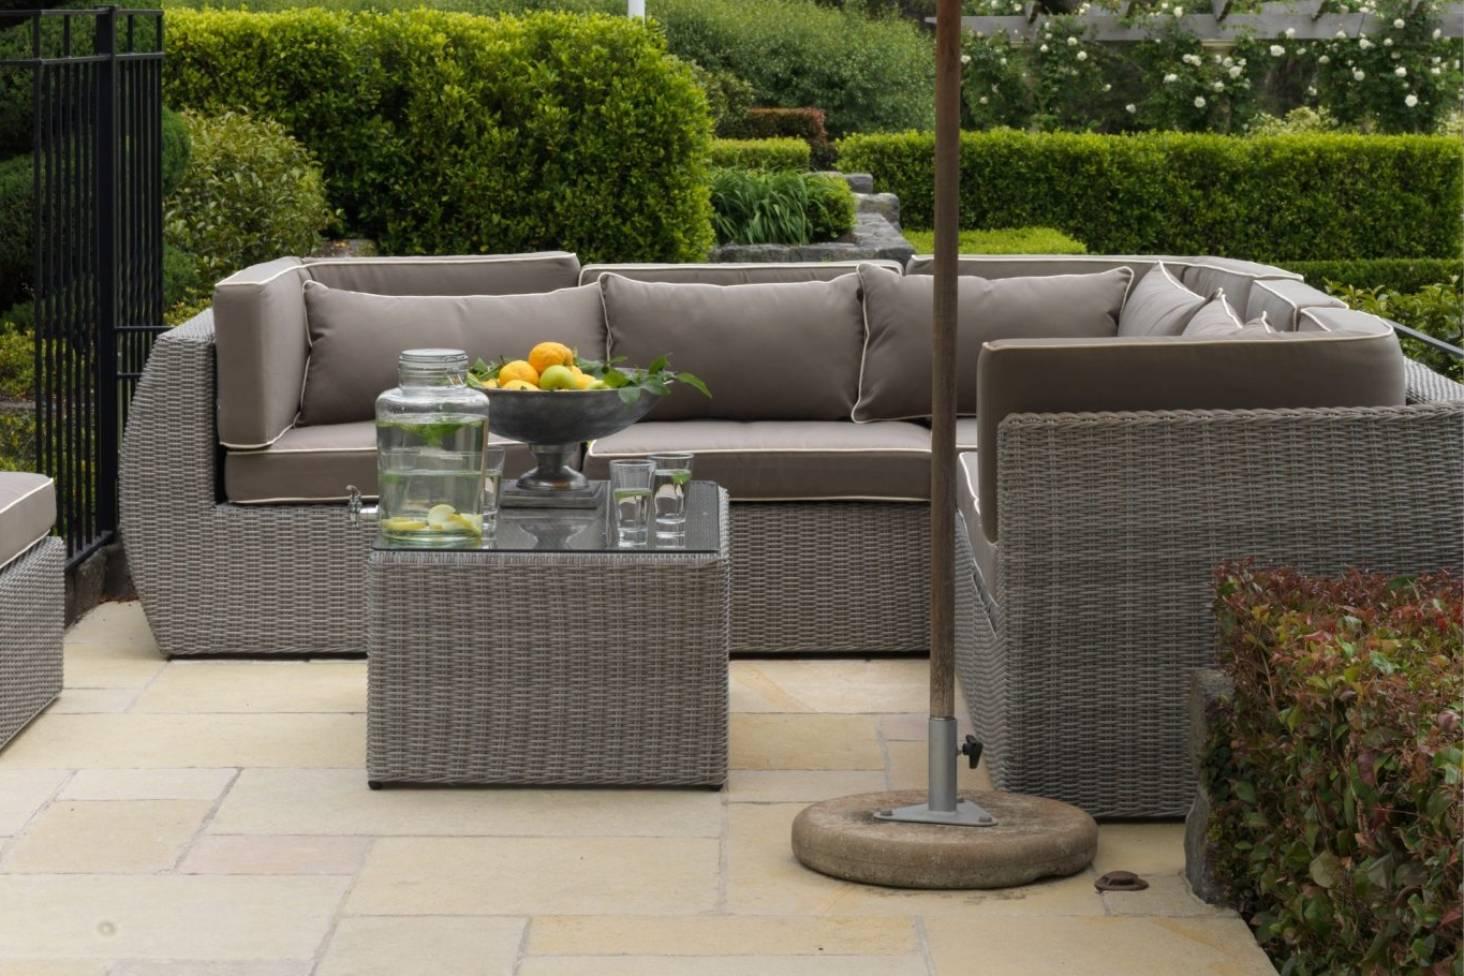 Matt rilkoff the great plastic wicker outdoor furniture con job